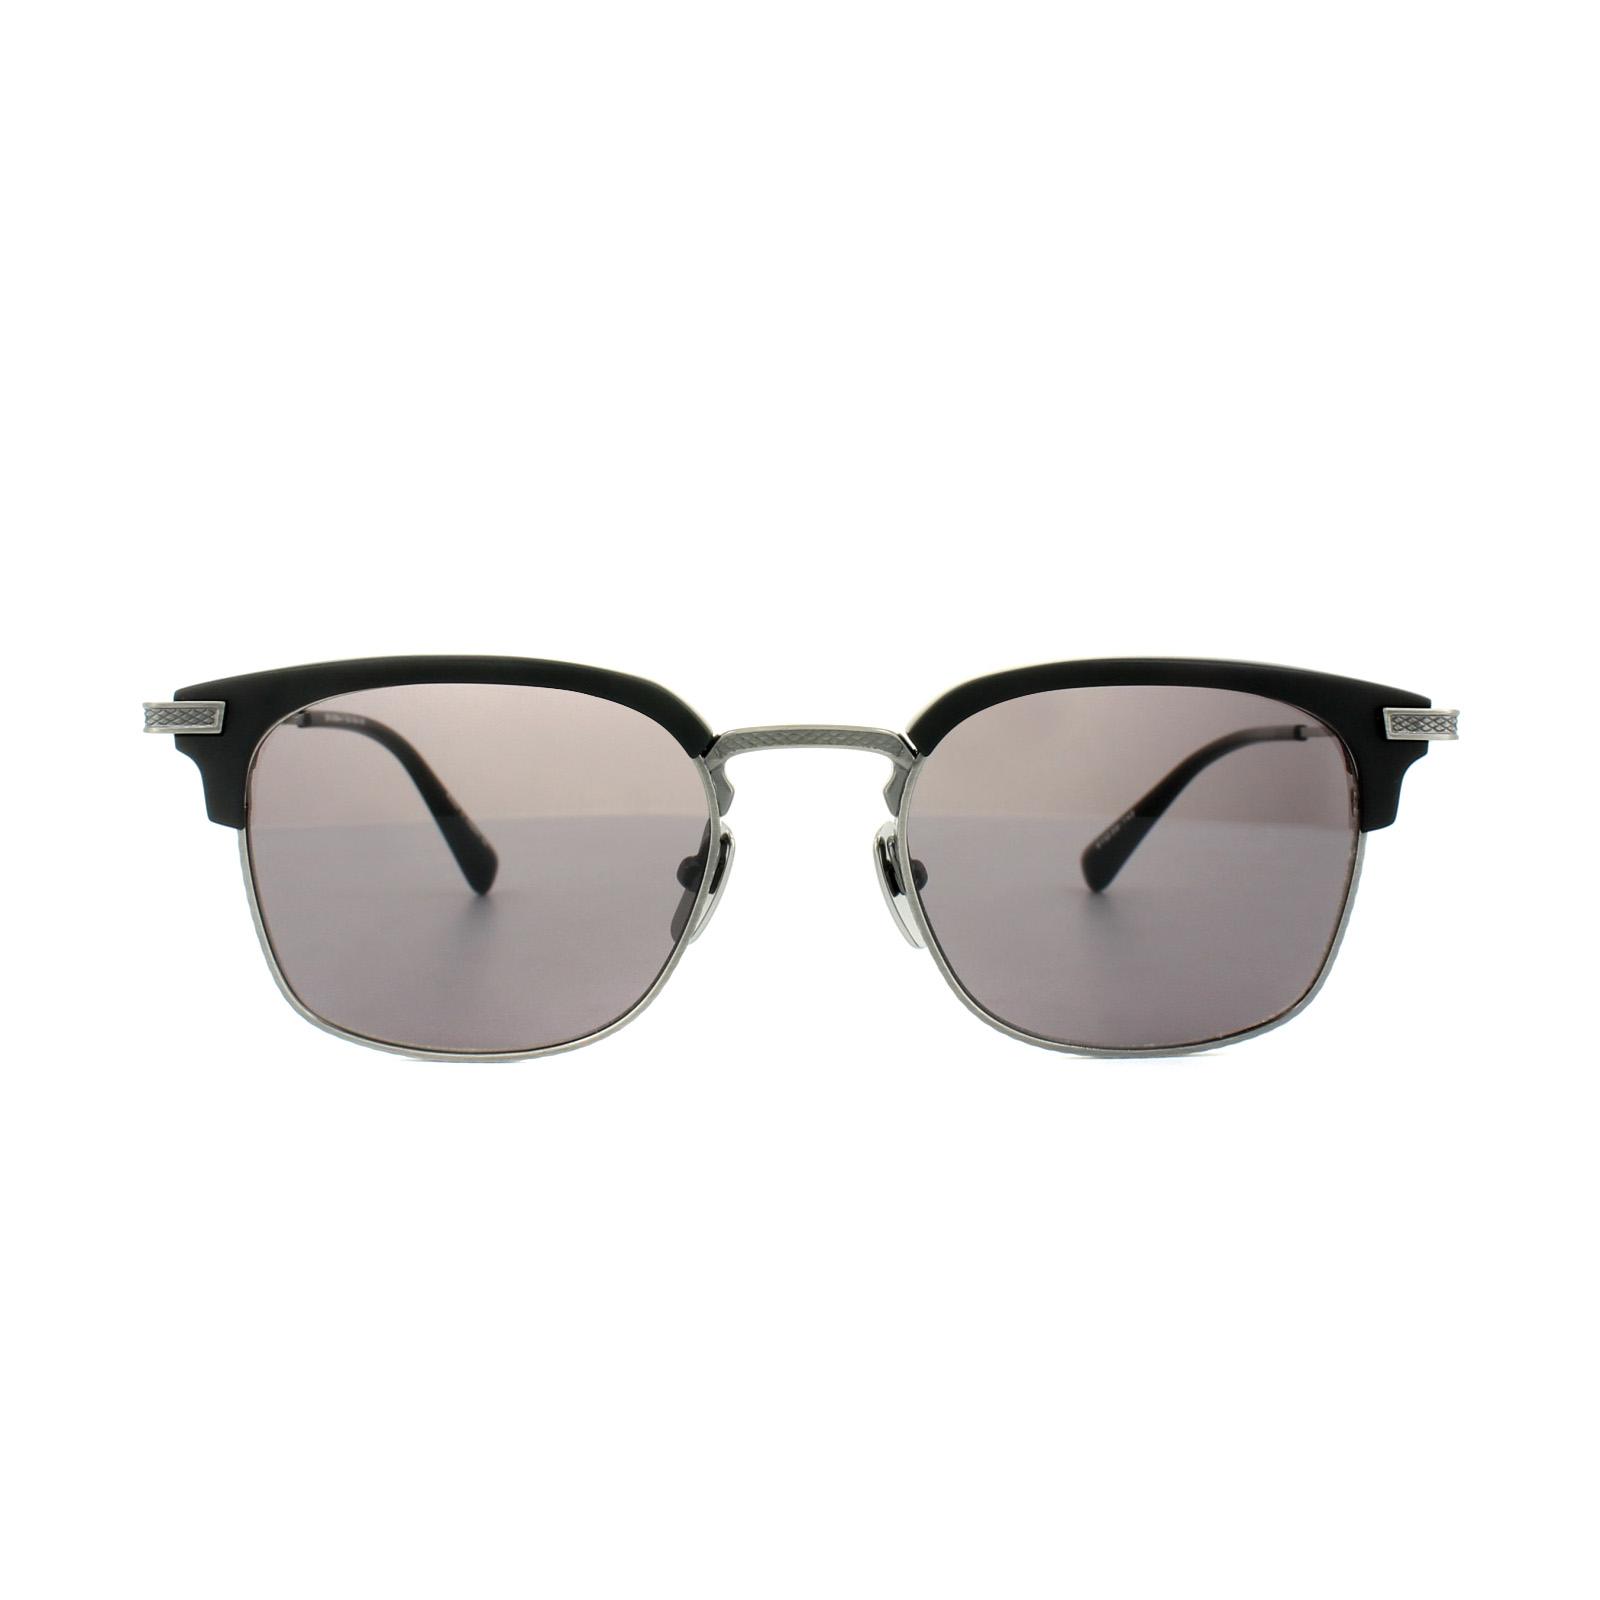 99d240115f Dita Nomad Sunglasses Thumbnail 1 Dita Nomad Sunglasses Thumbnail 2 ...